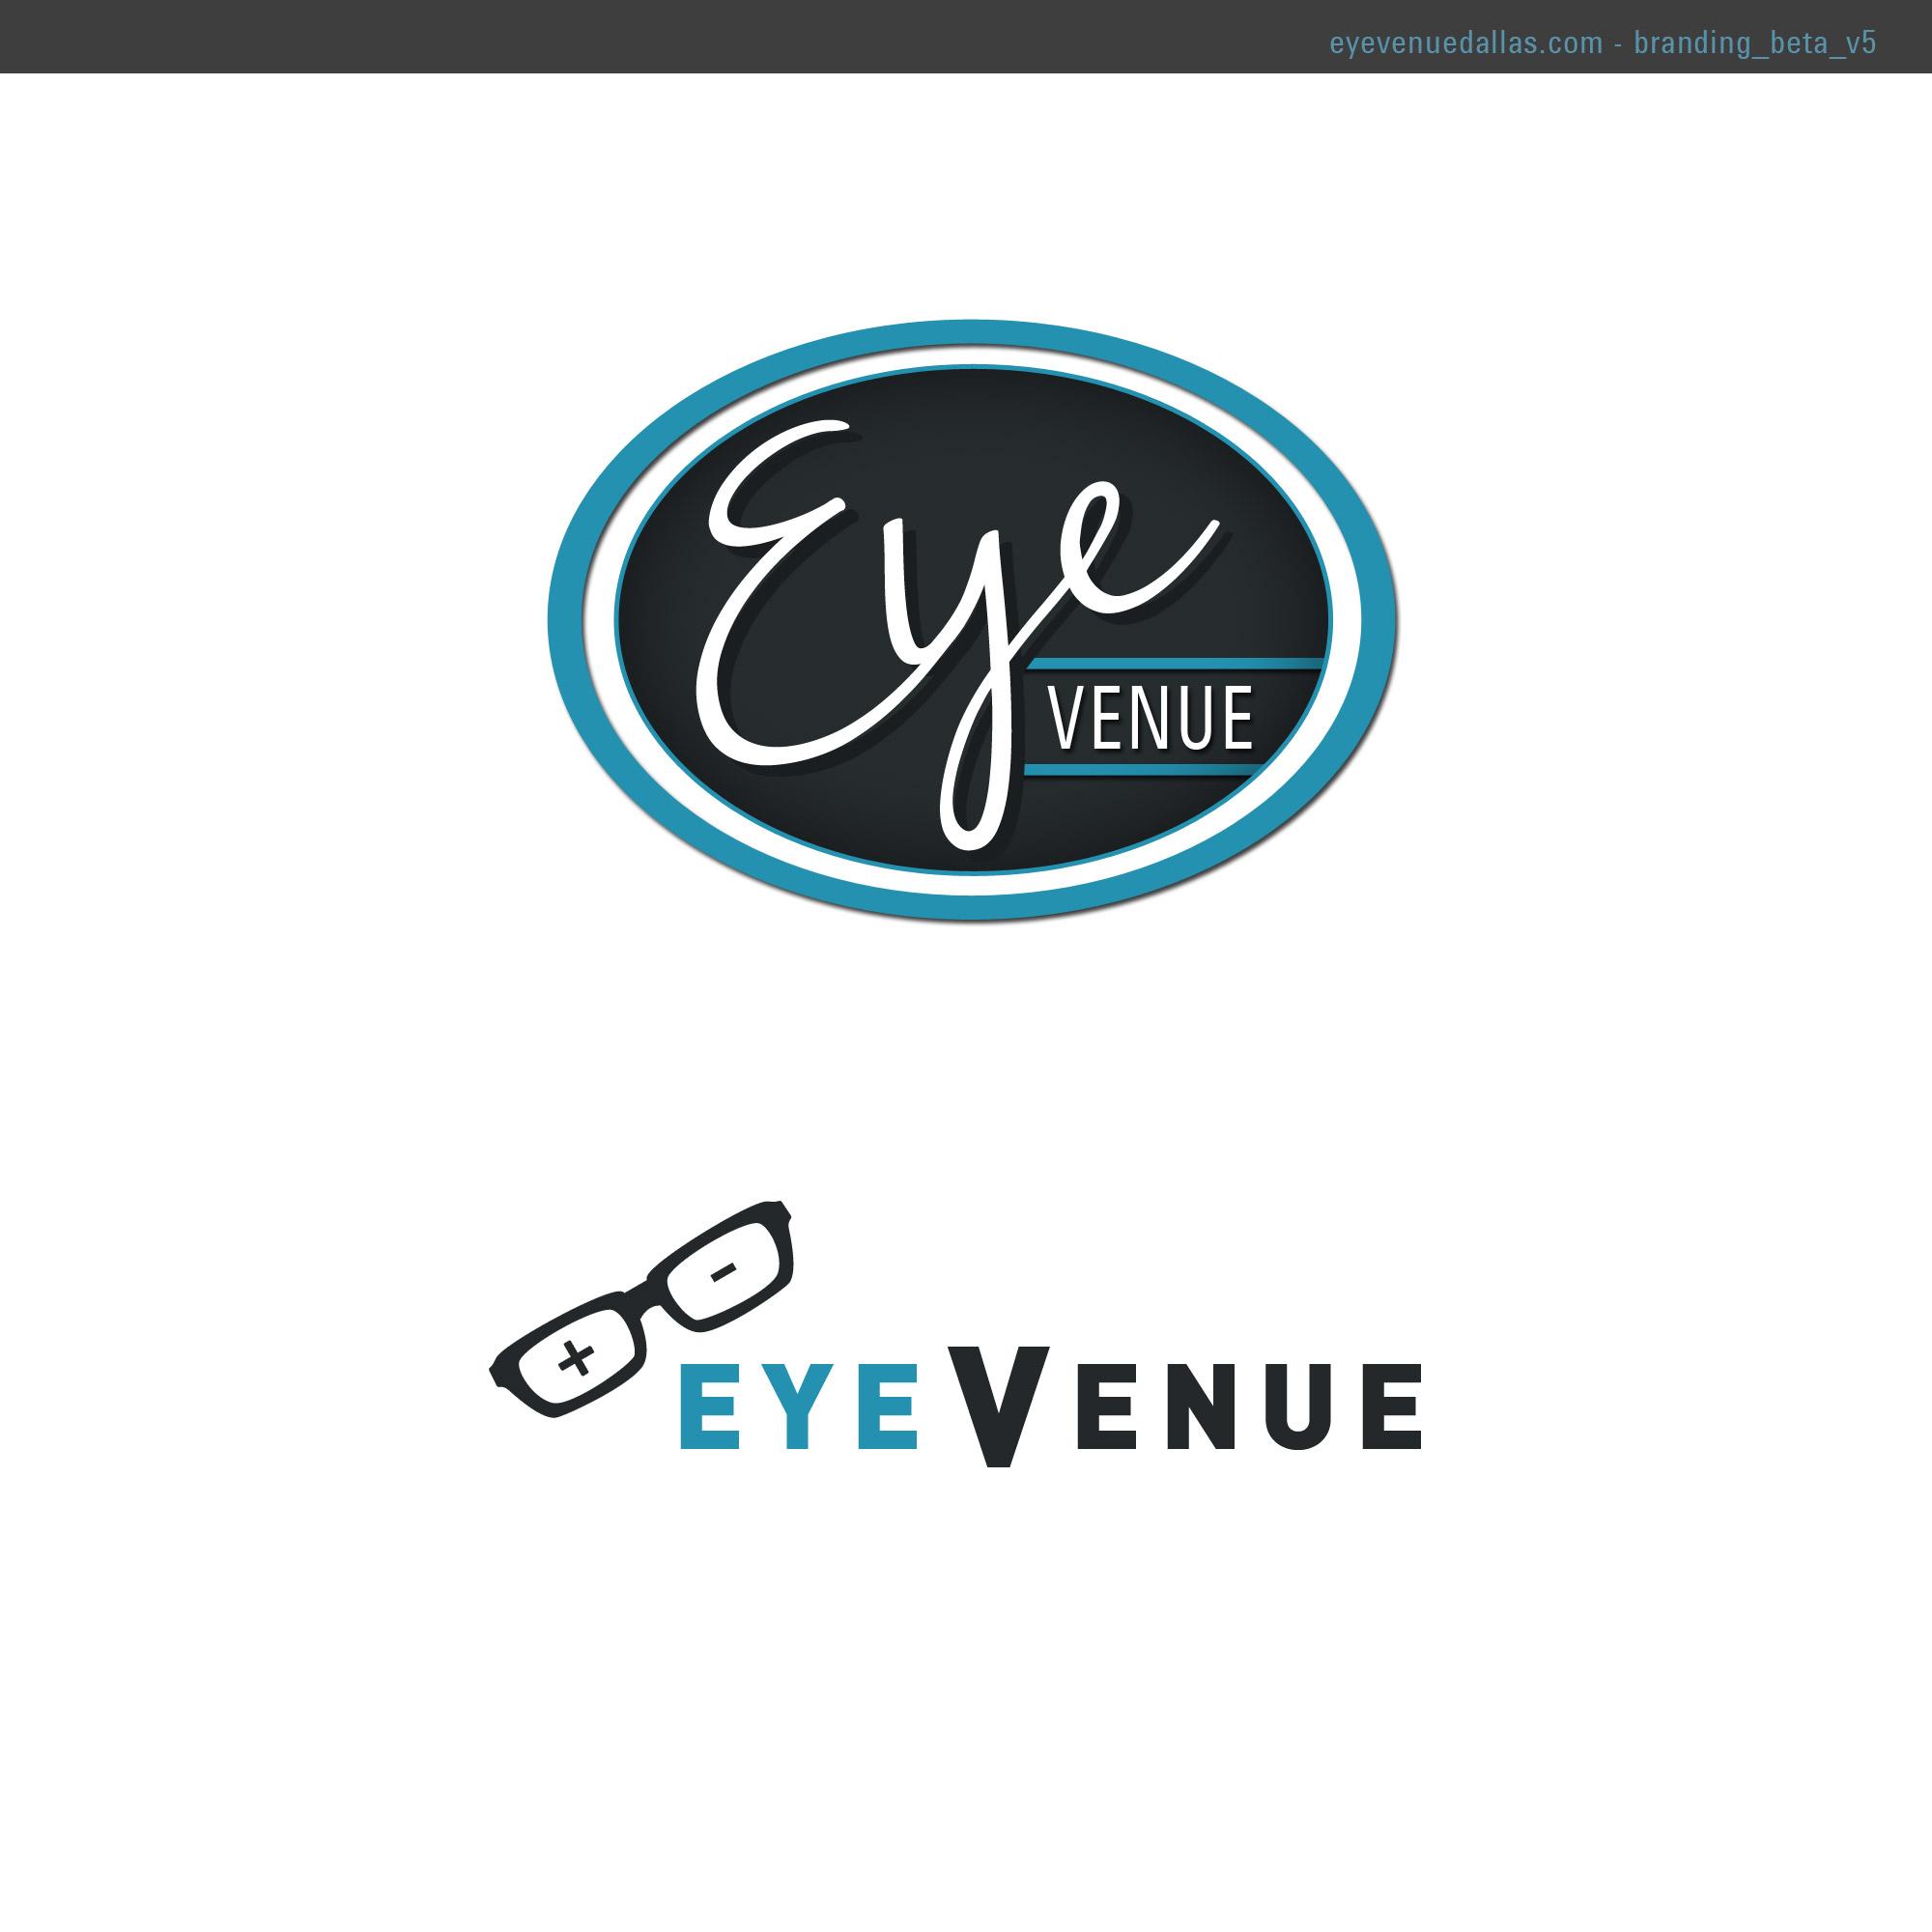 Eyevenue_Final_7.jpg